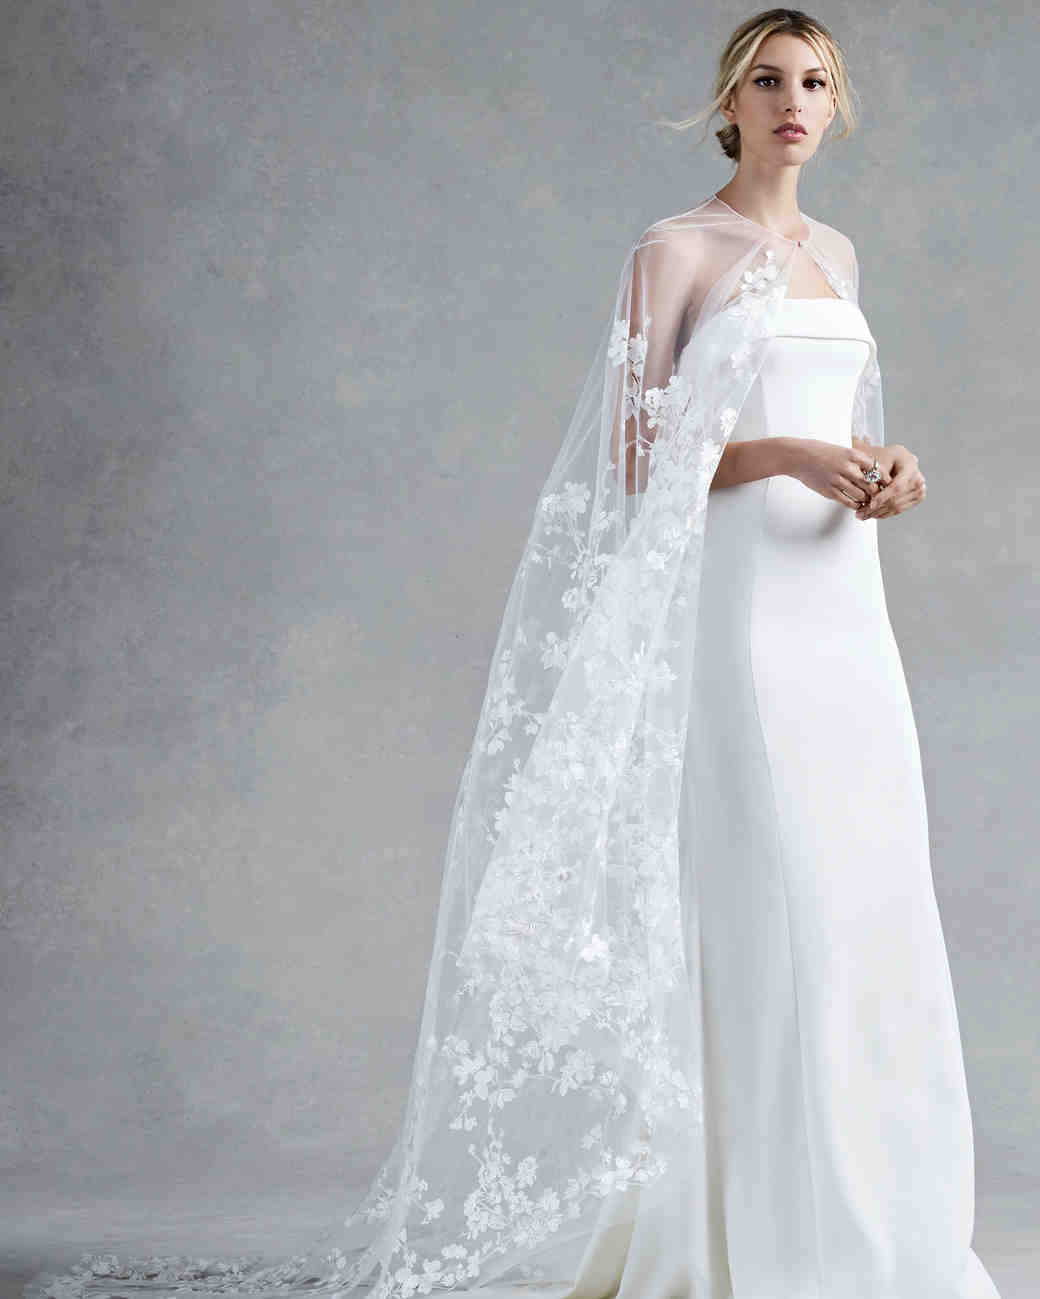 Oscar de la renta fall 2017 wedding dress collection martha oscar de la renta fall 2017 wedding dress collection junglespirit Image collections